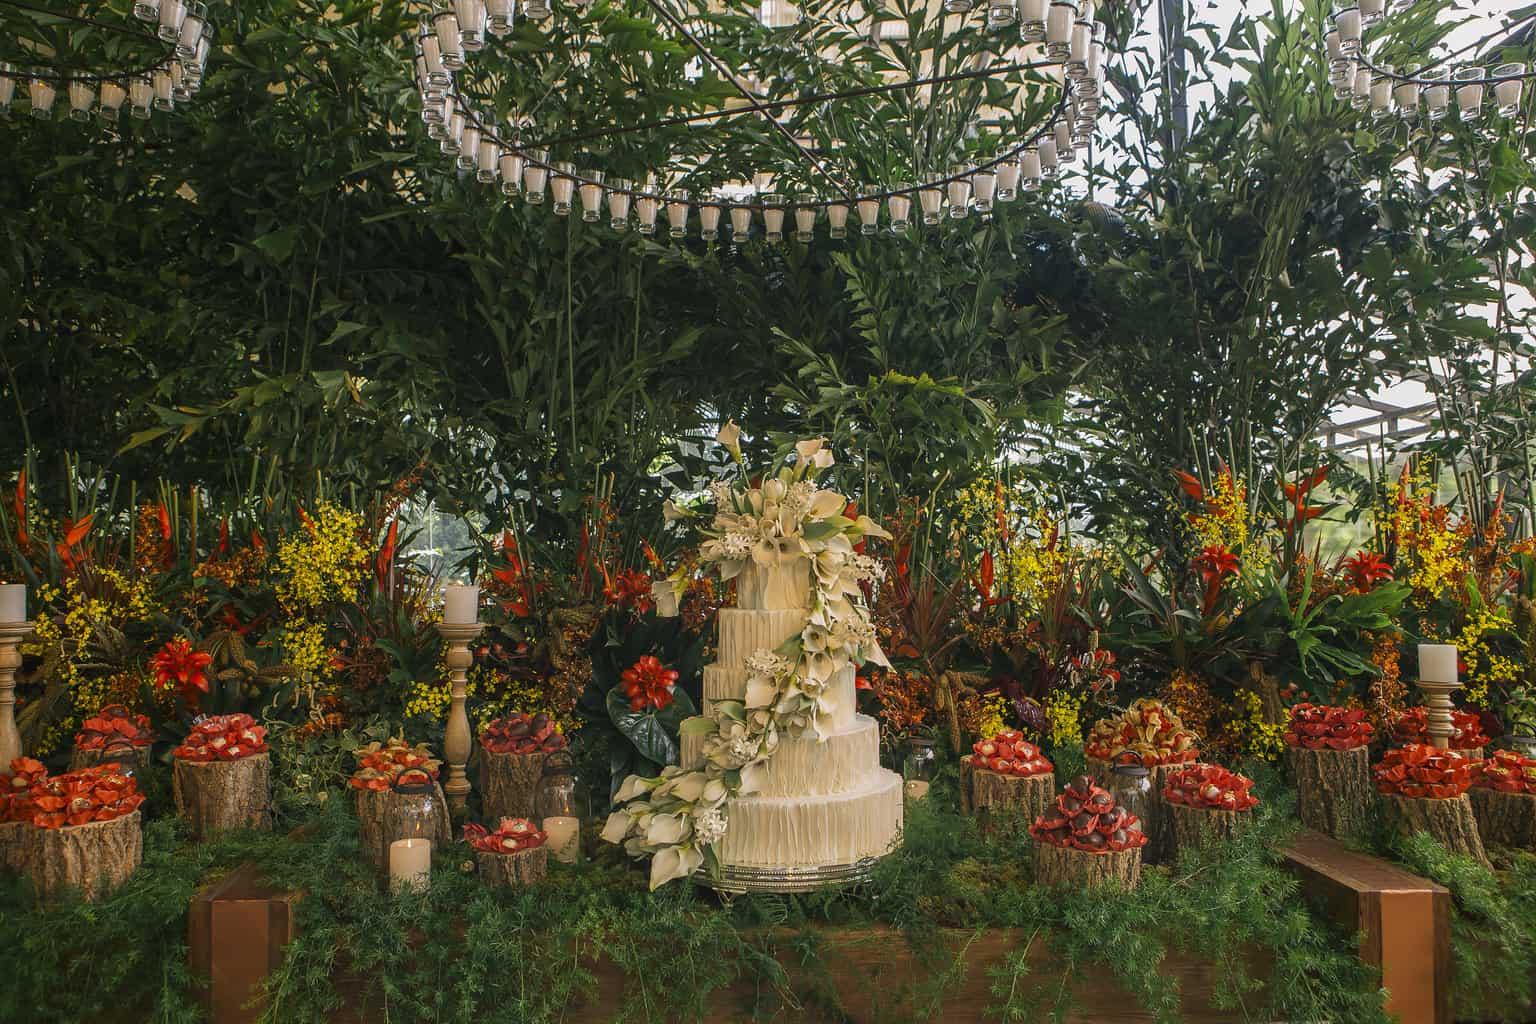 Fernanda-e-Max-Fazenda-Santa-Barbara-Foto-Torin-Zanette-Fabio-e-Telma-Decorações-The-King-Cake1897